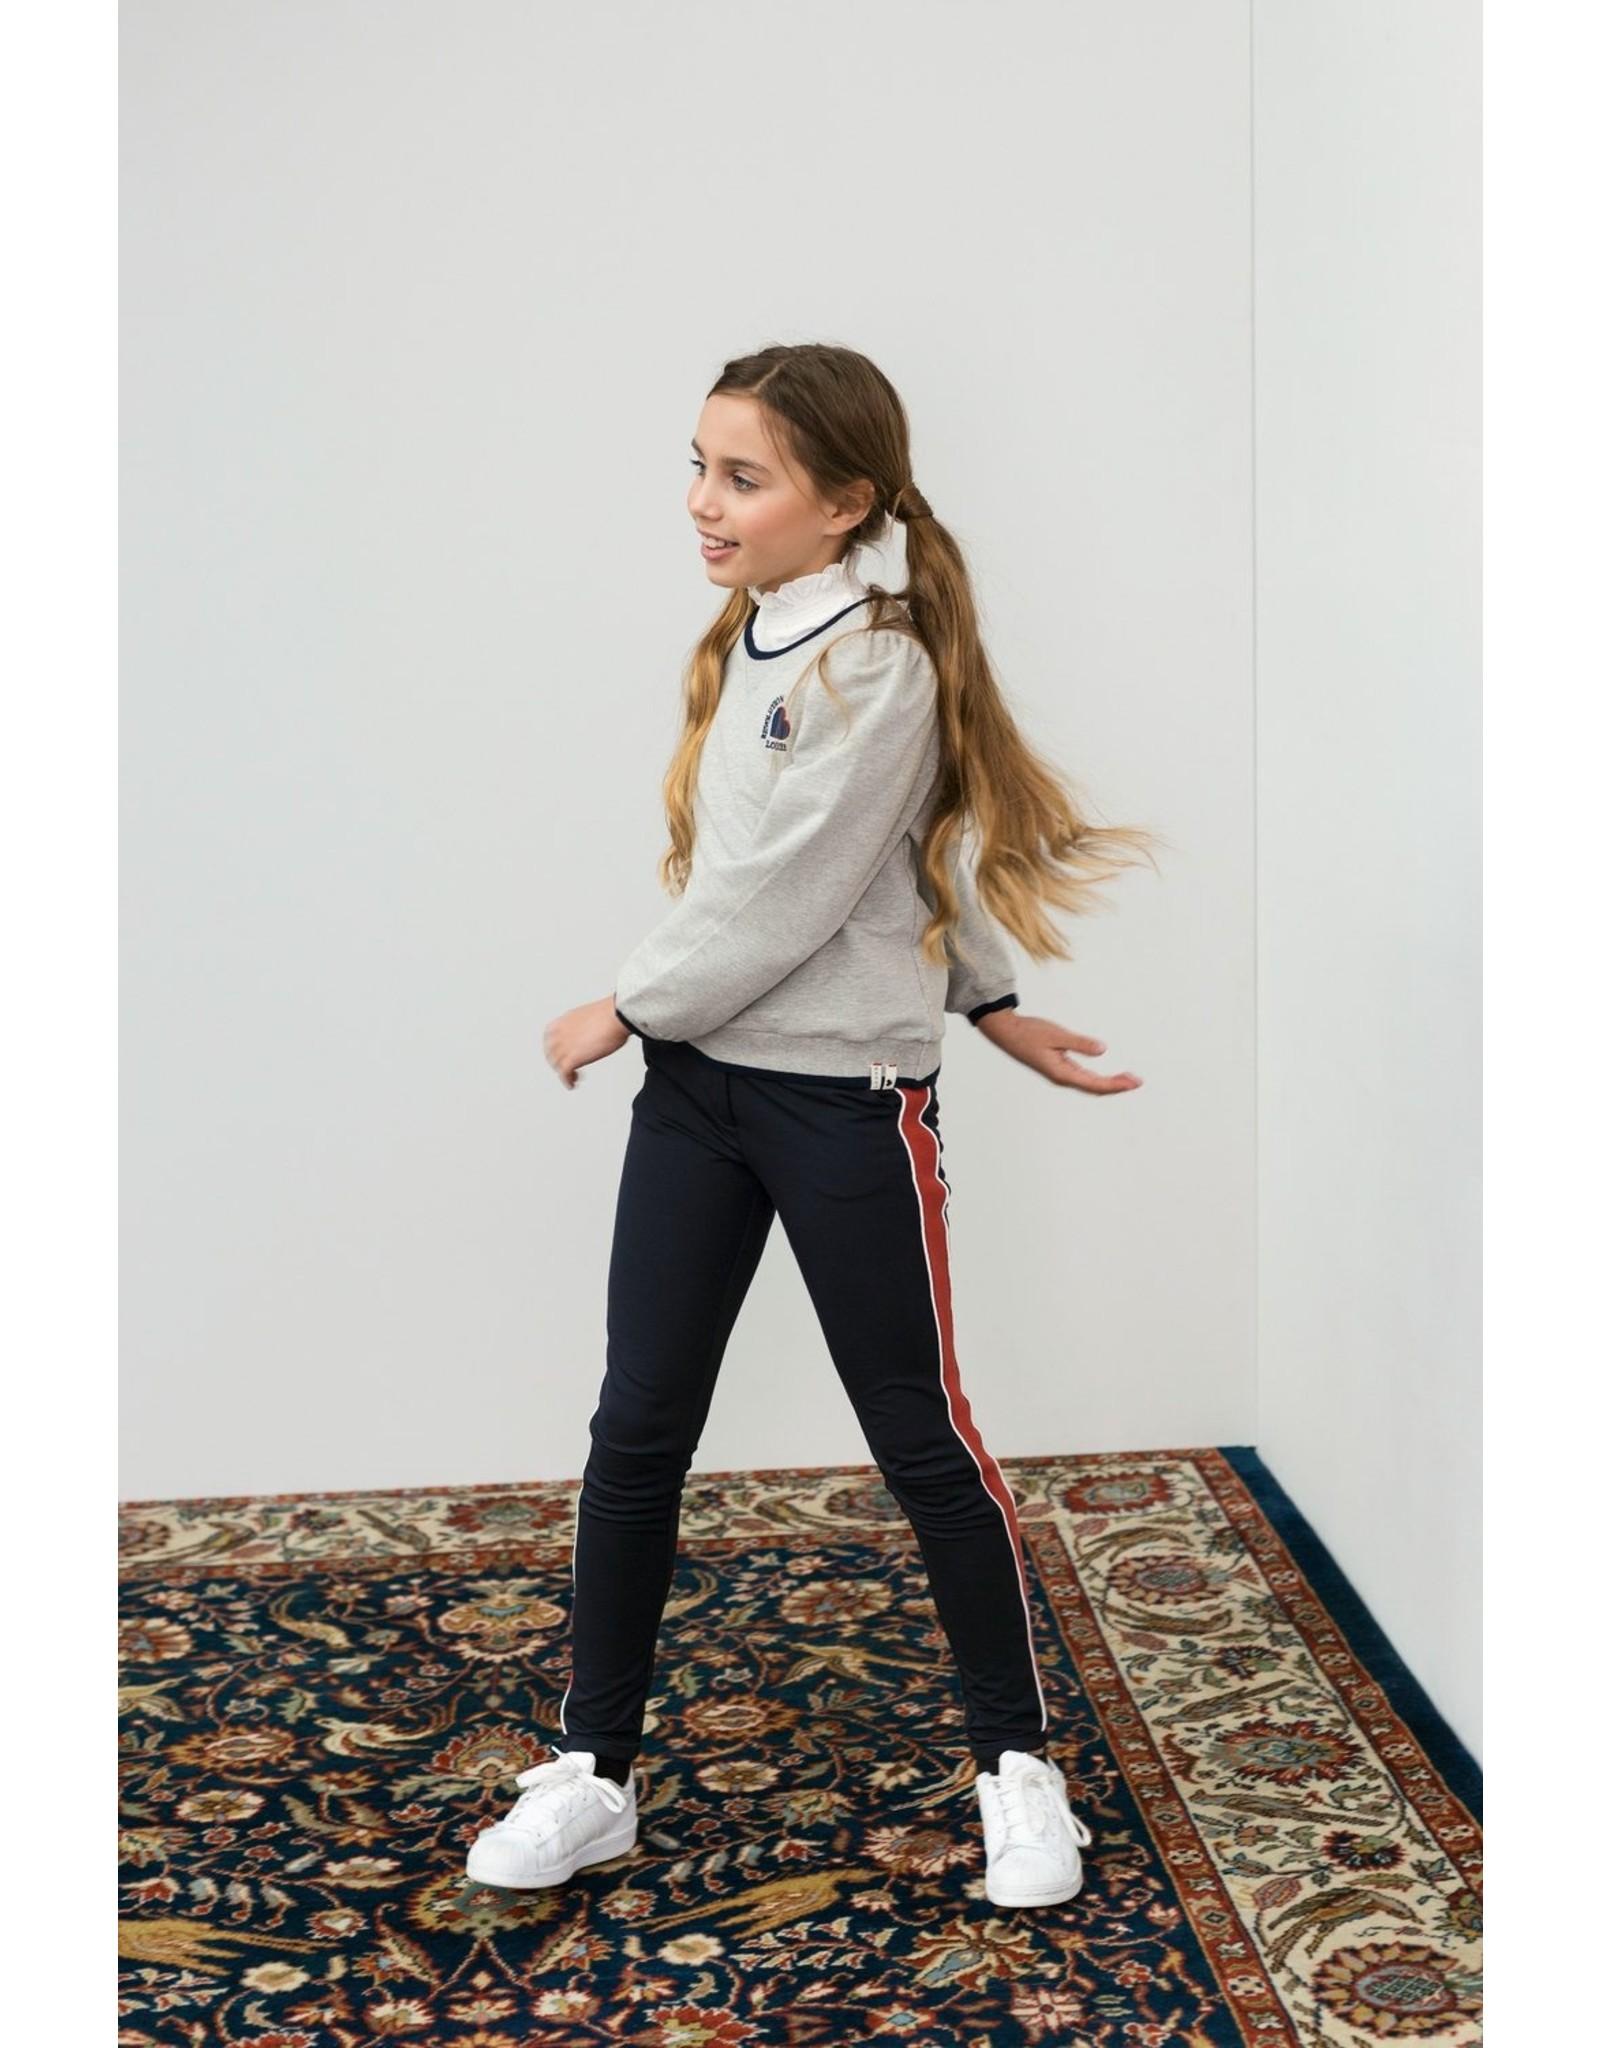 LOOXS 10sixteen Girls pants Midnight